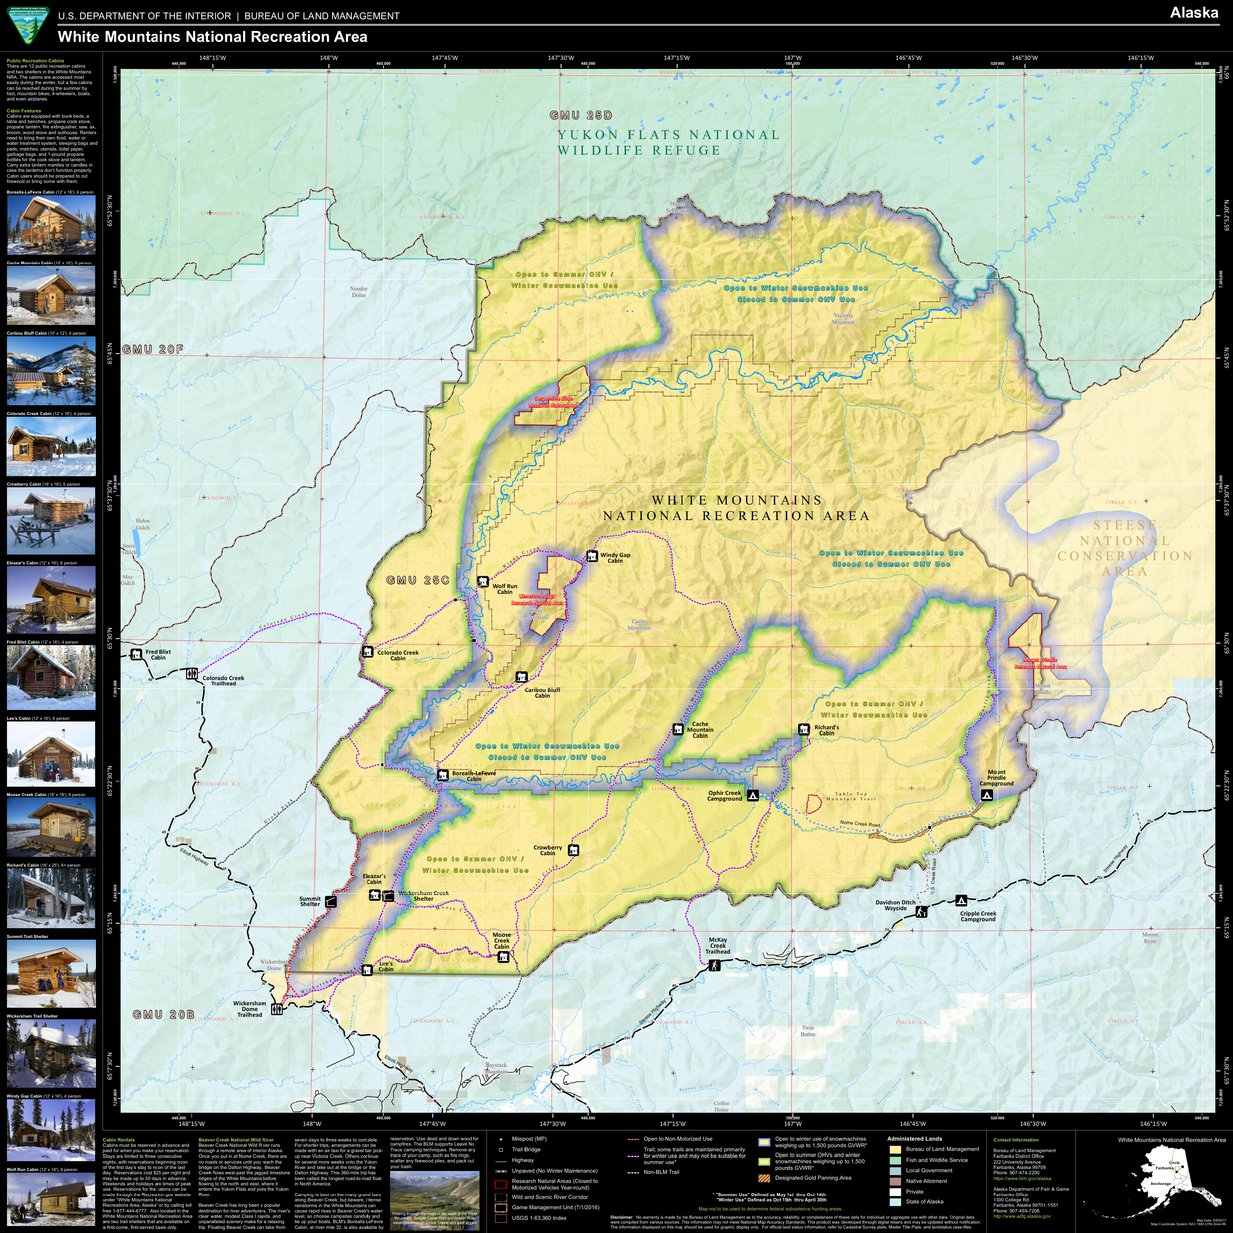 White Mountains National Recreation Area   Bureau of Land